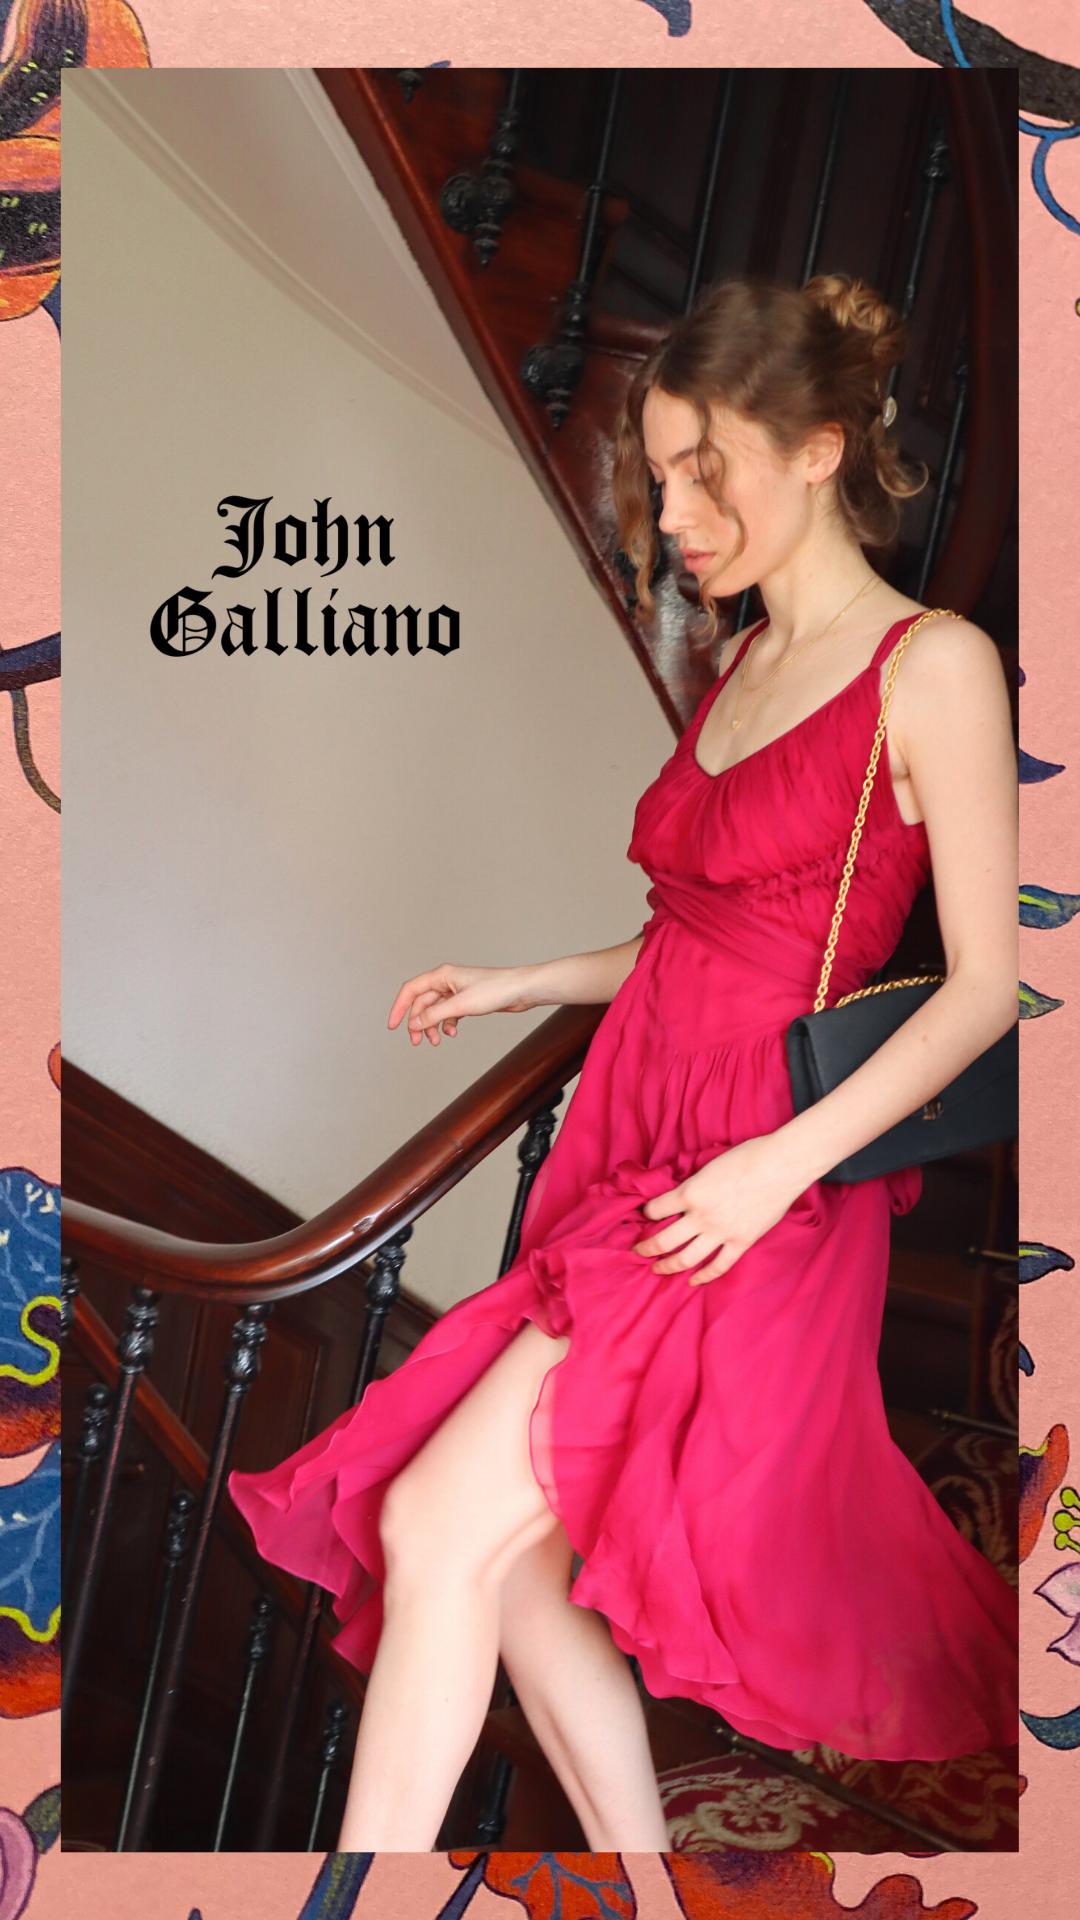 John Galliano Dress - 590€